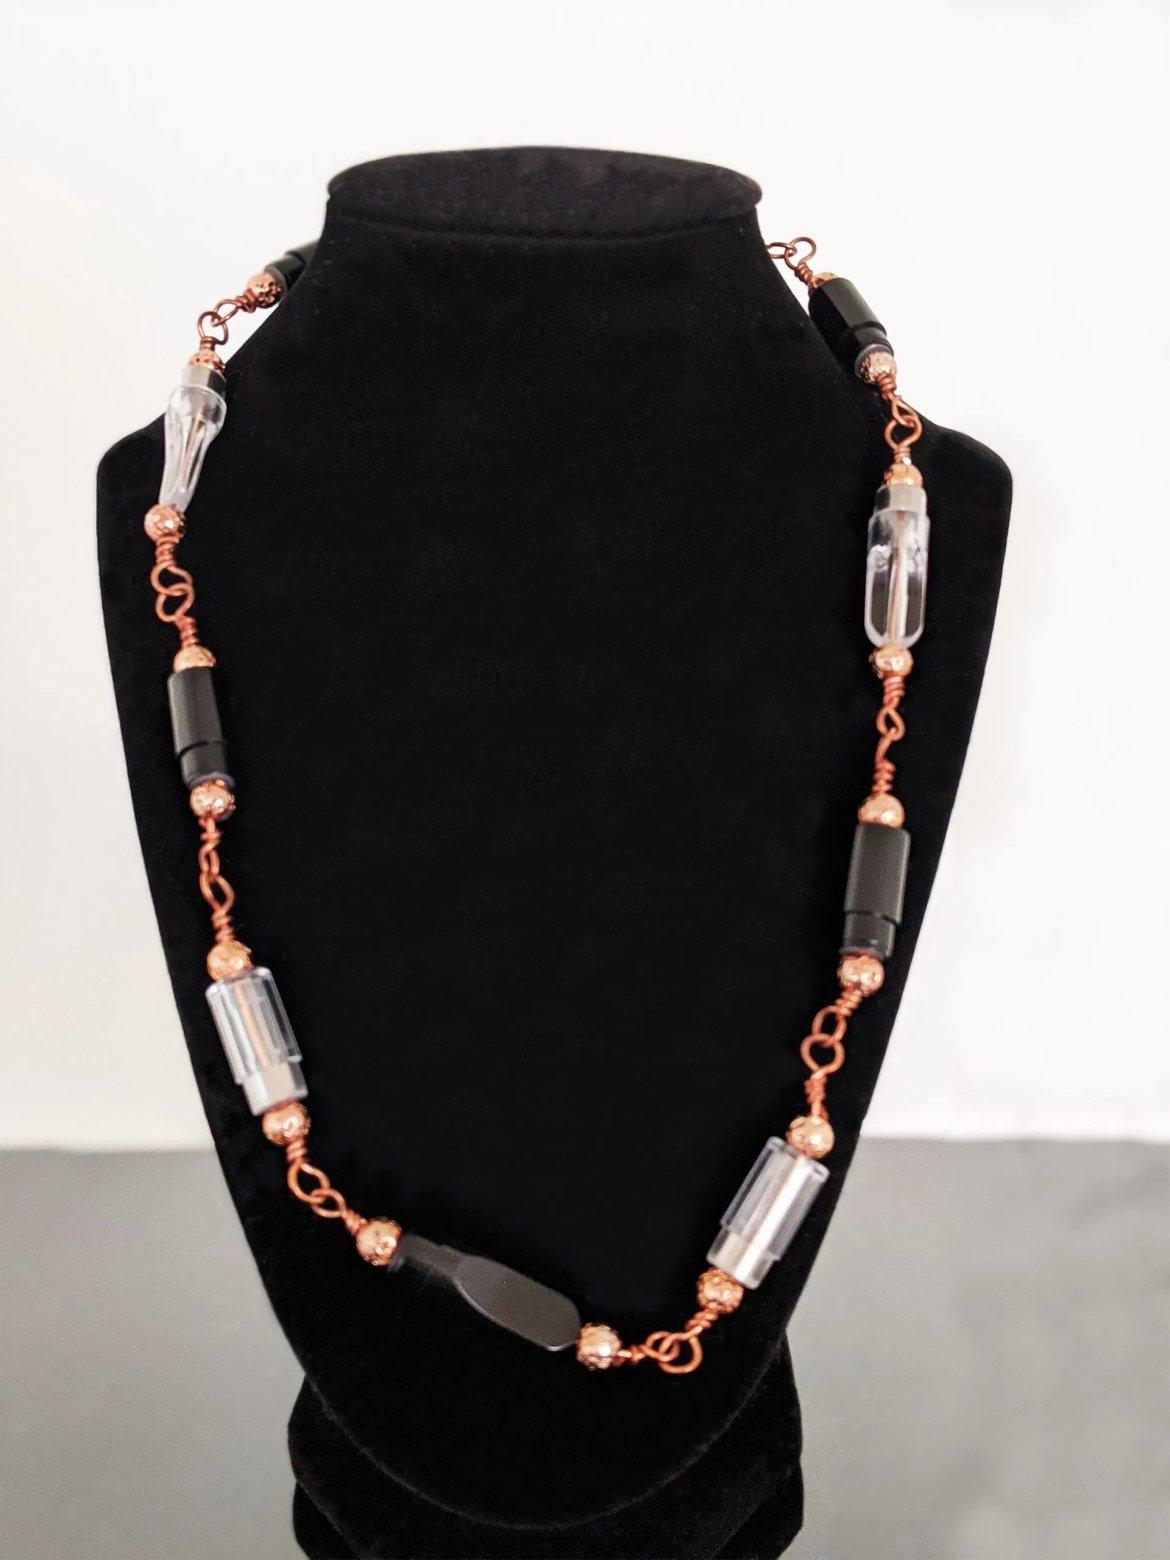 carts necklace